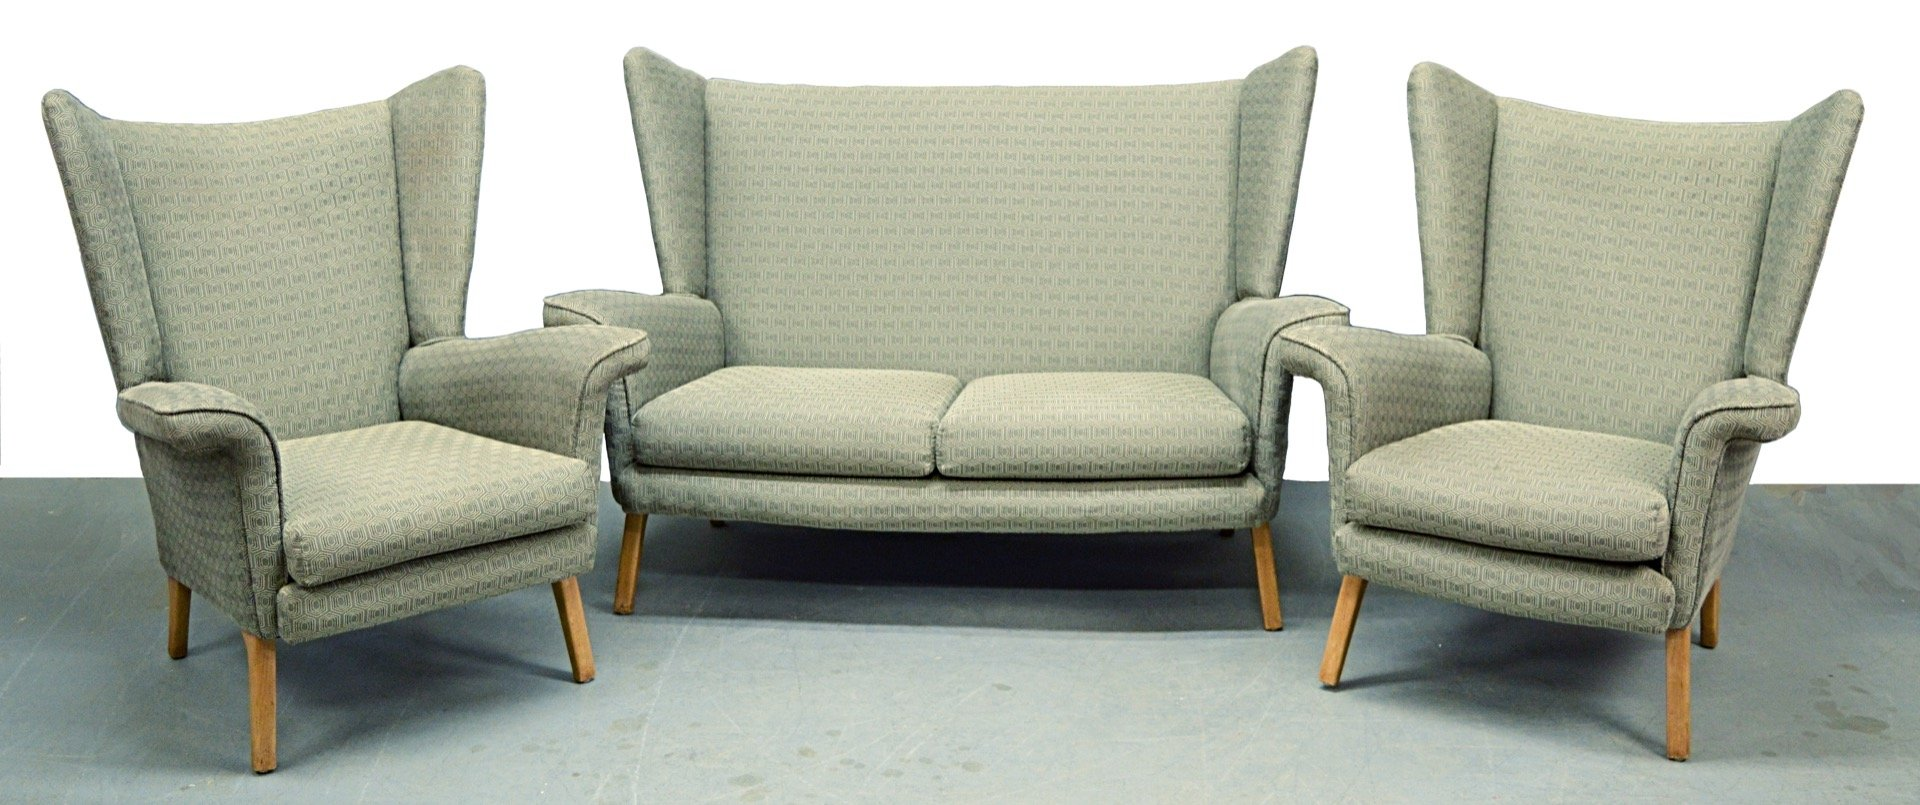 Mid Century 3 Piece Living Room Set, 1950s